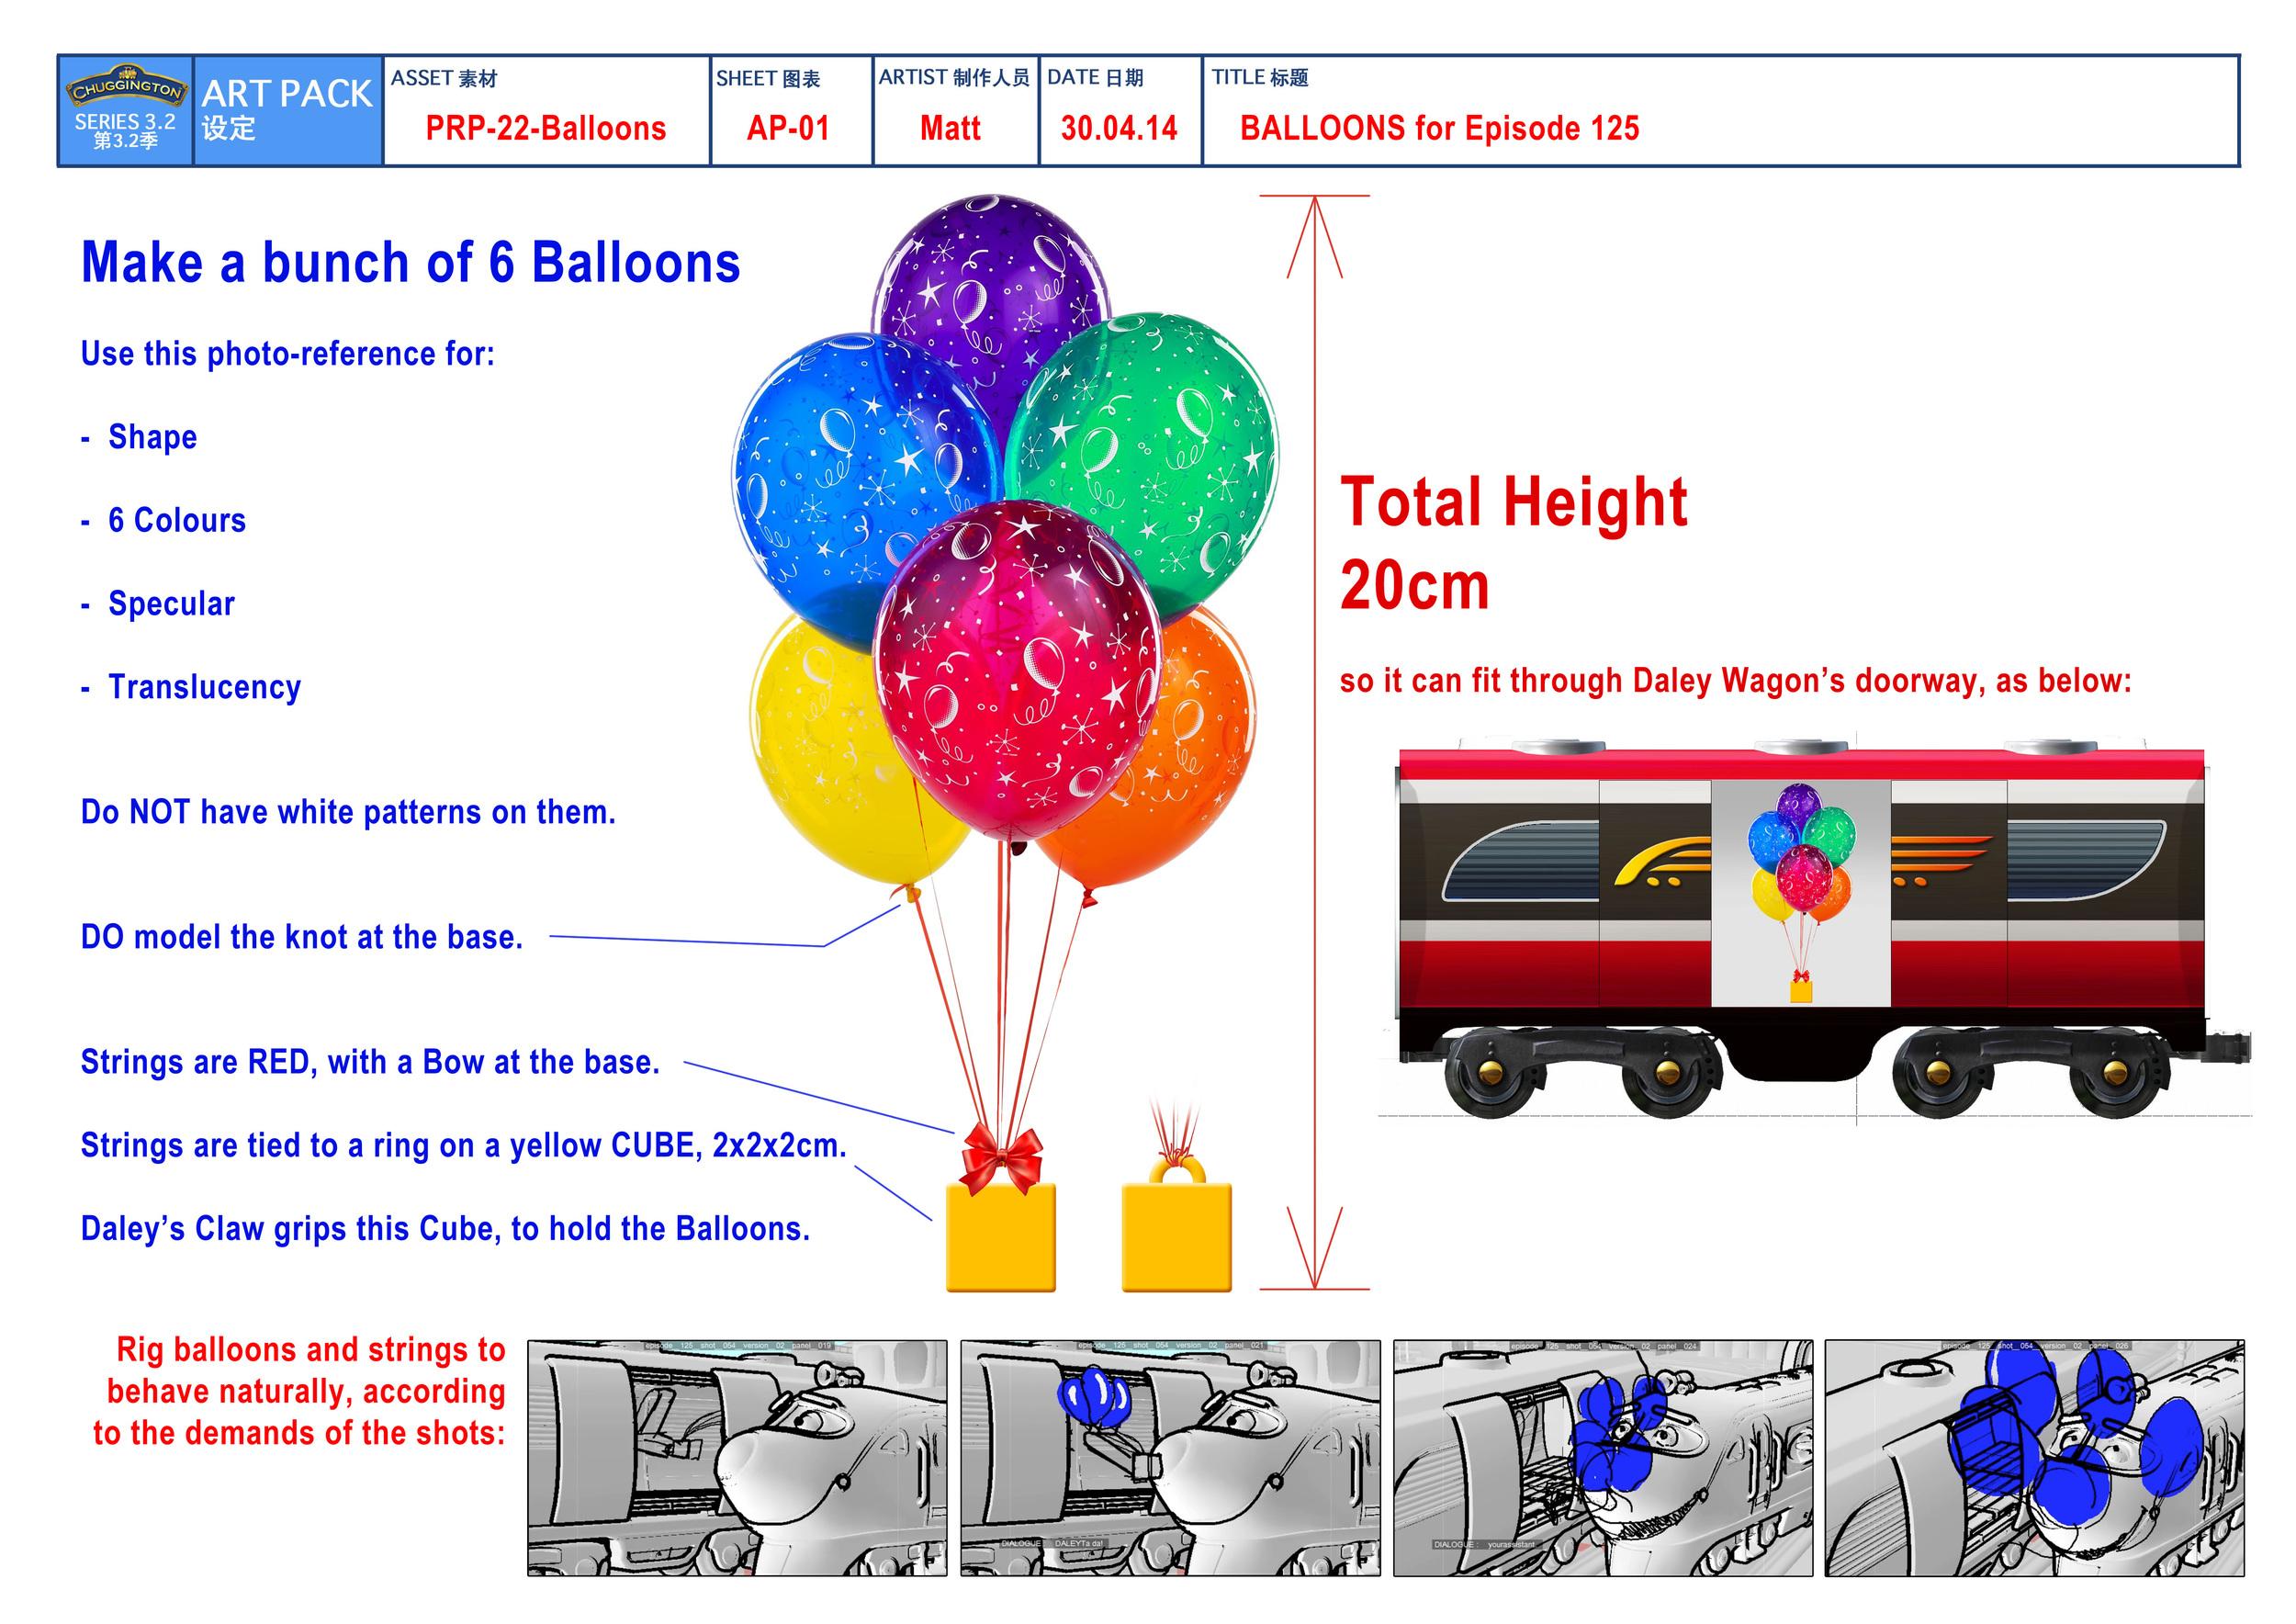 PRP-Balloons_AP-01_2014-04-30.jpg